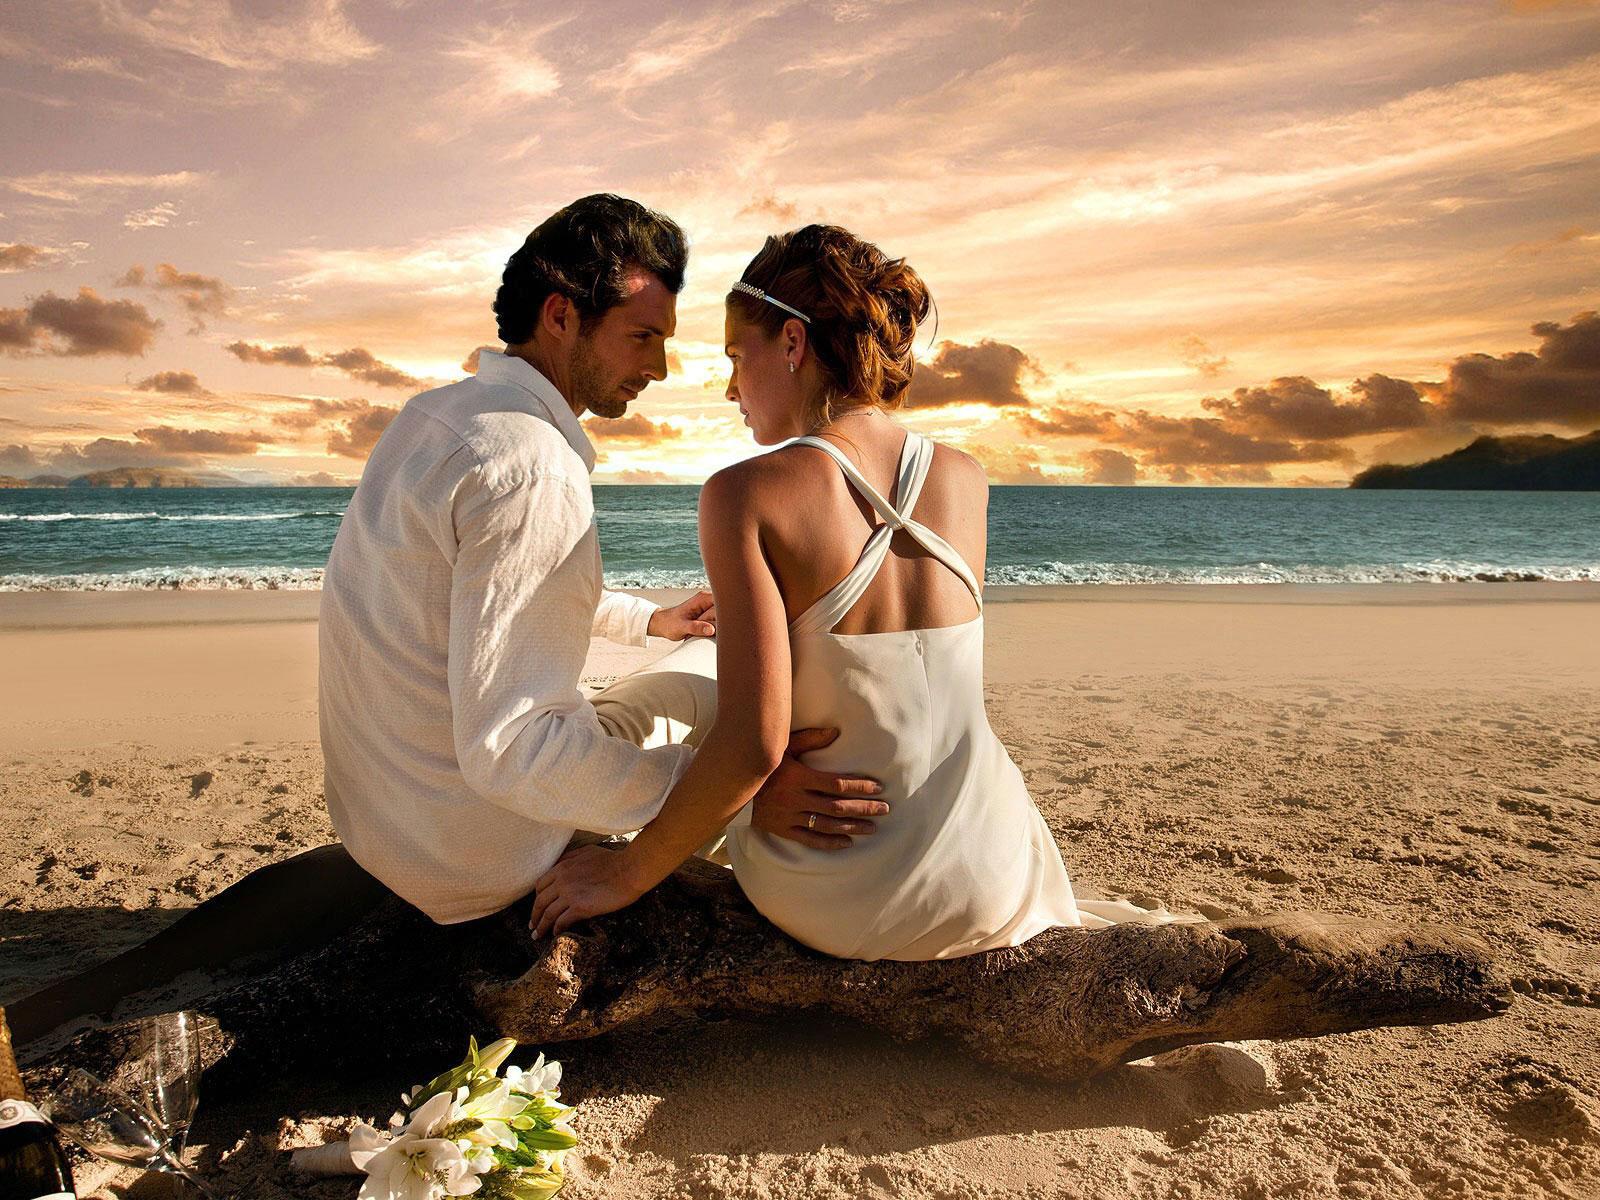 Romantic Couples Photography Love